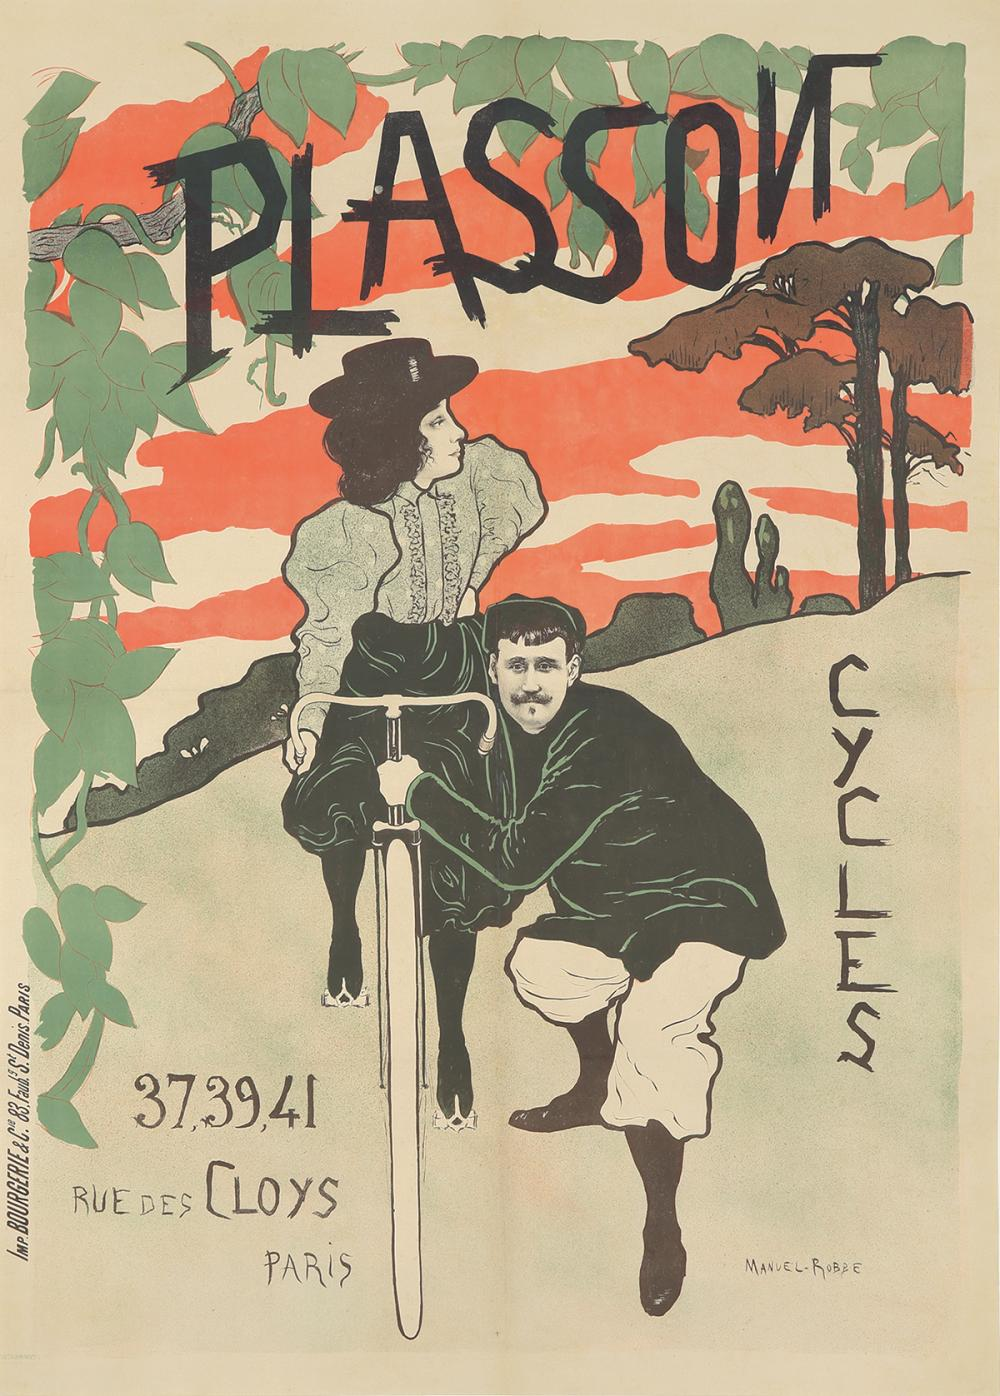 Cycles Plasson. 1897.